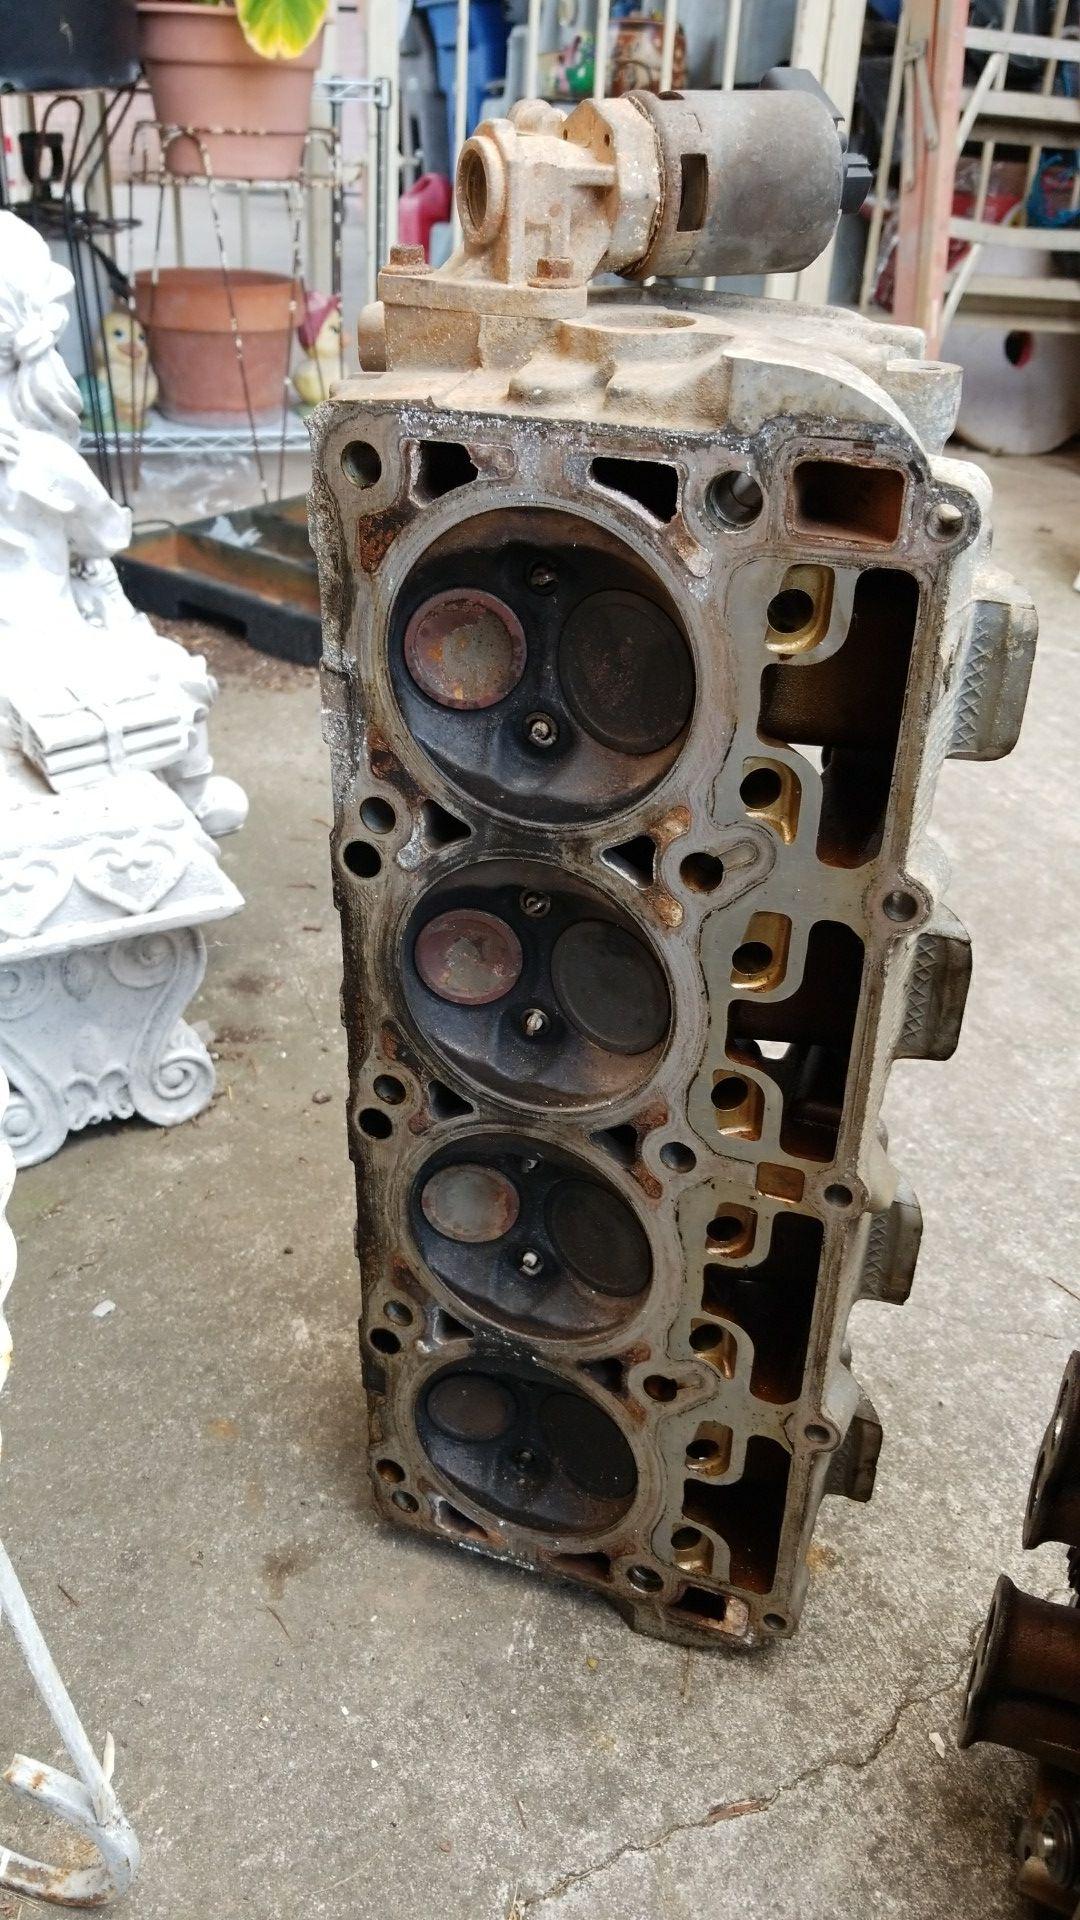 2006 hemi engine 5.7 Ford rebuild